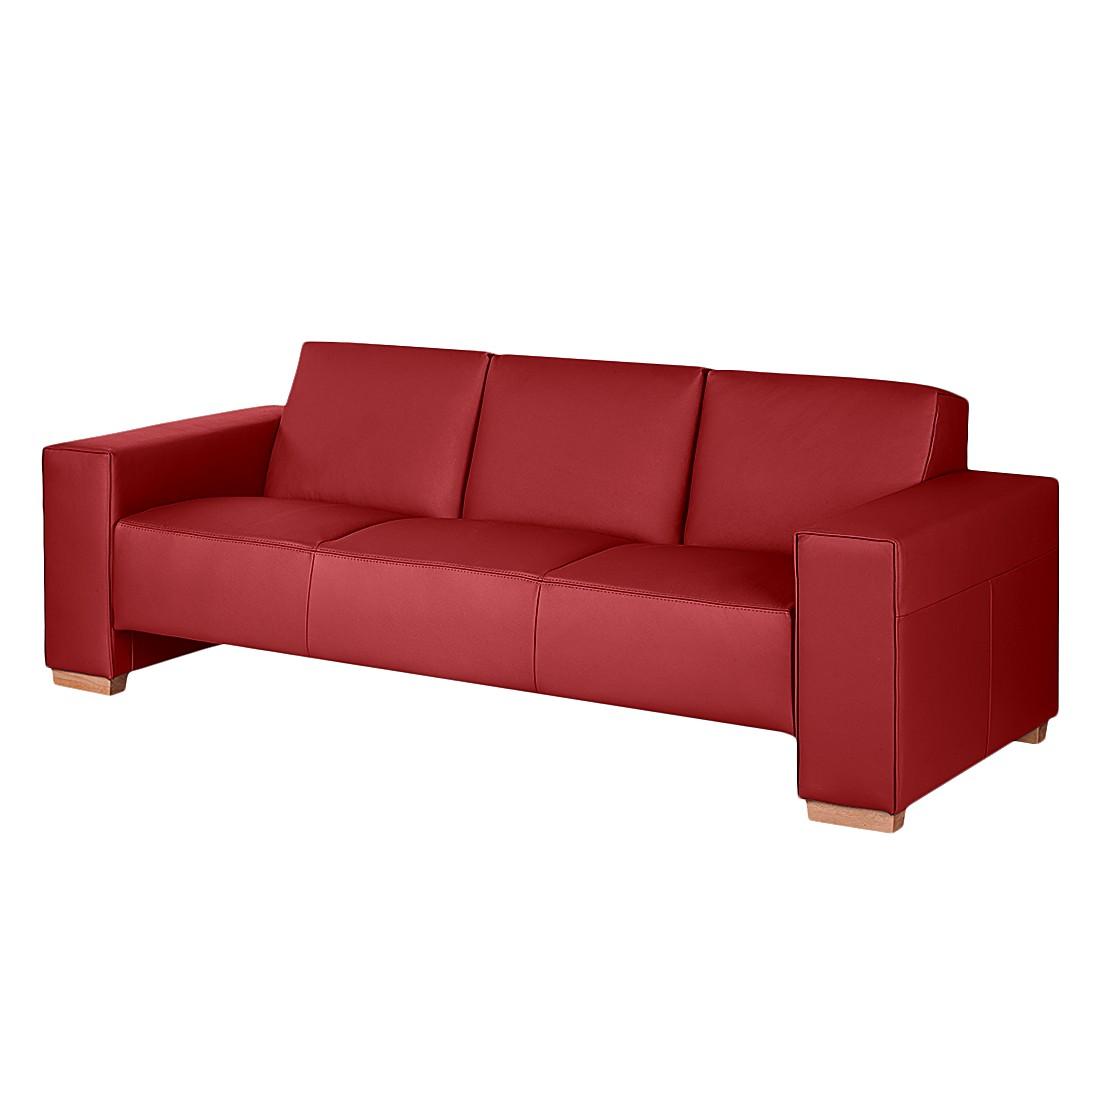 Sofa Midar (3-Sitzer) – Echtleder Rot, roomscape jetzt kaufen